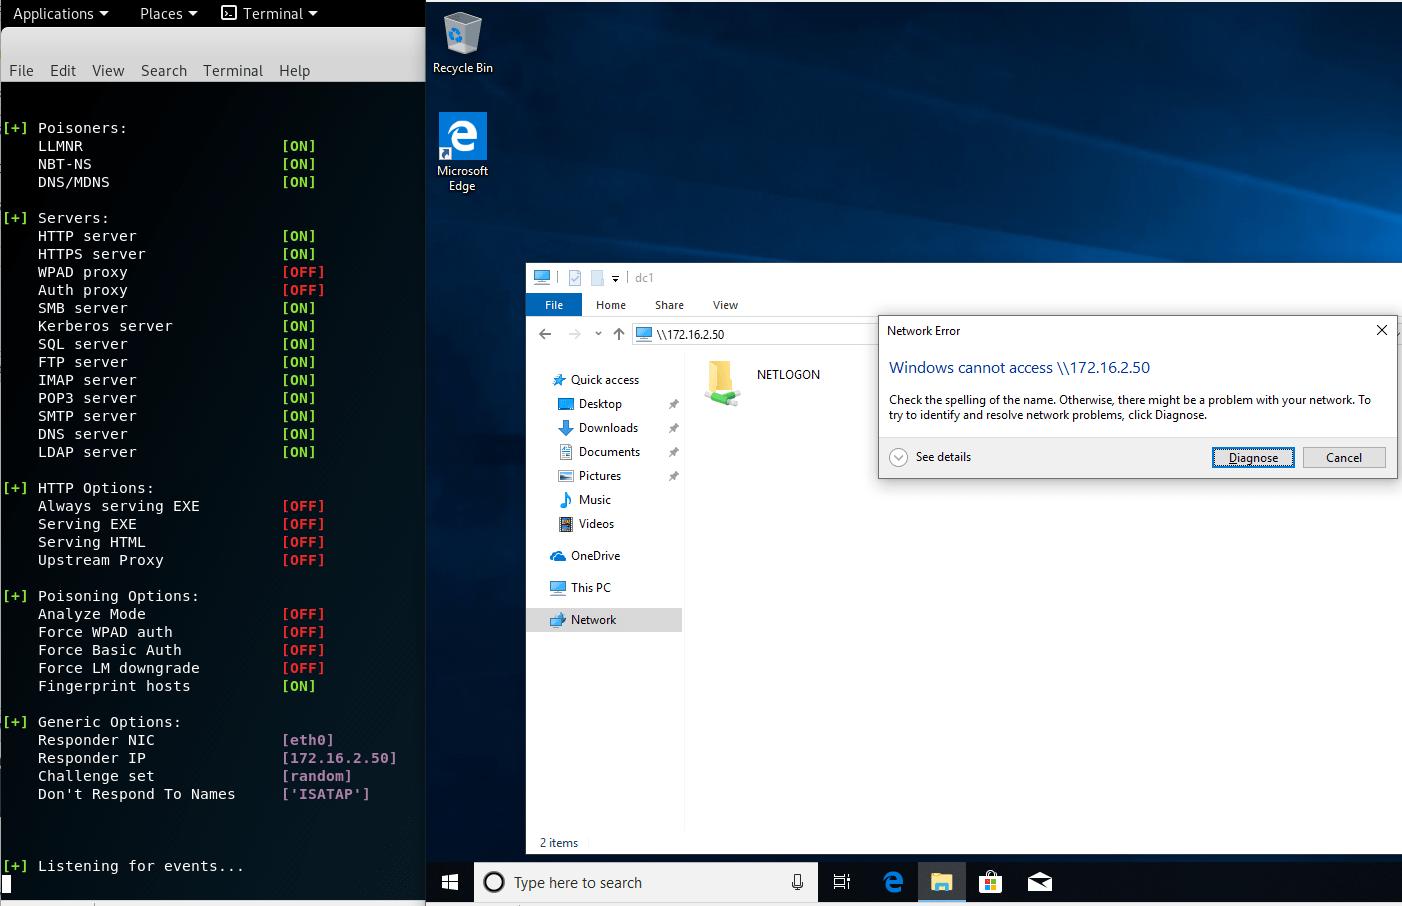 Event 9 Security Kerberos